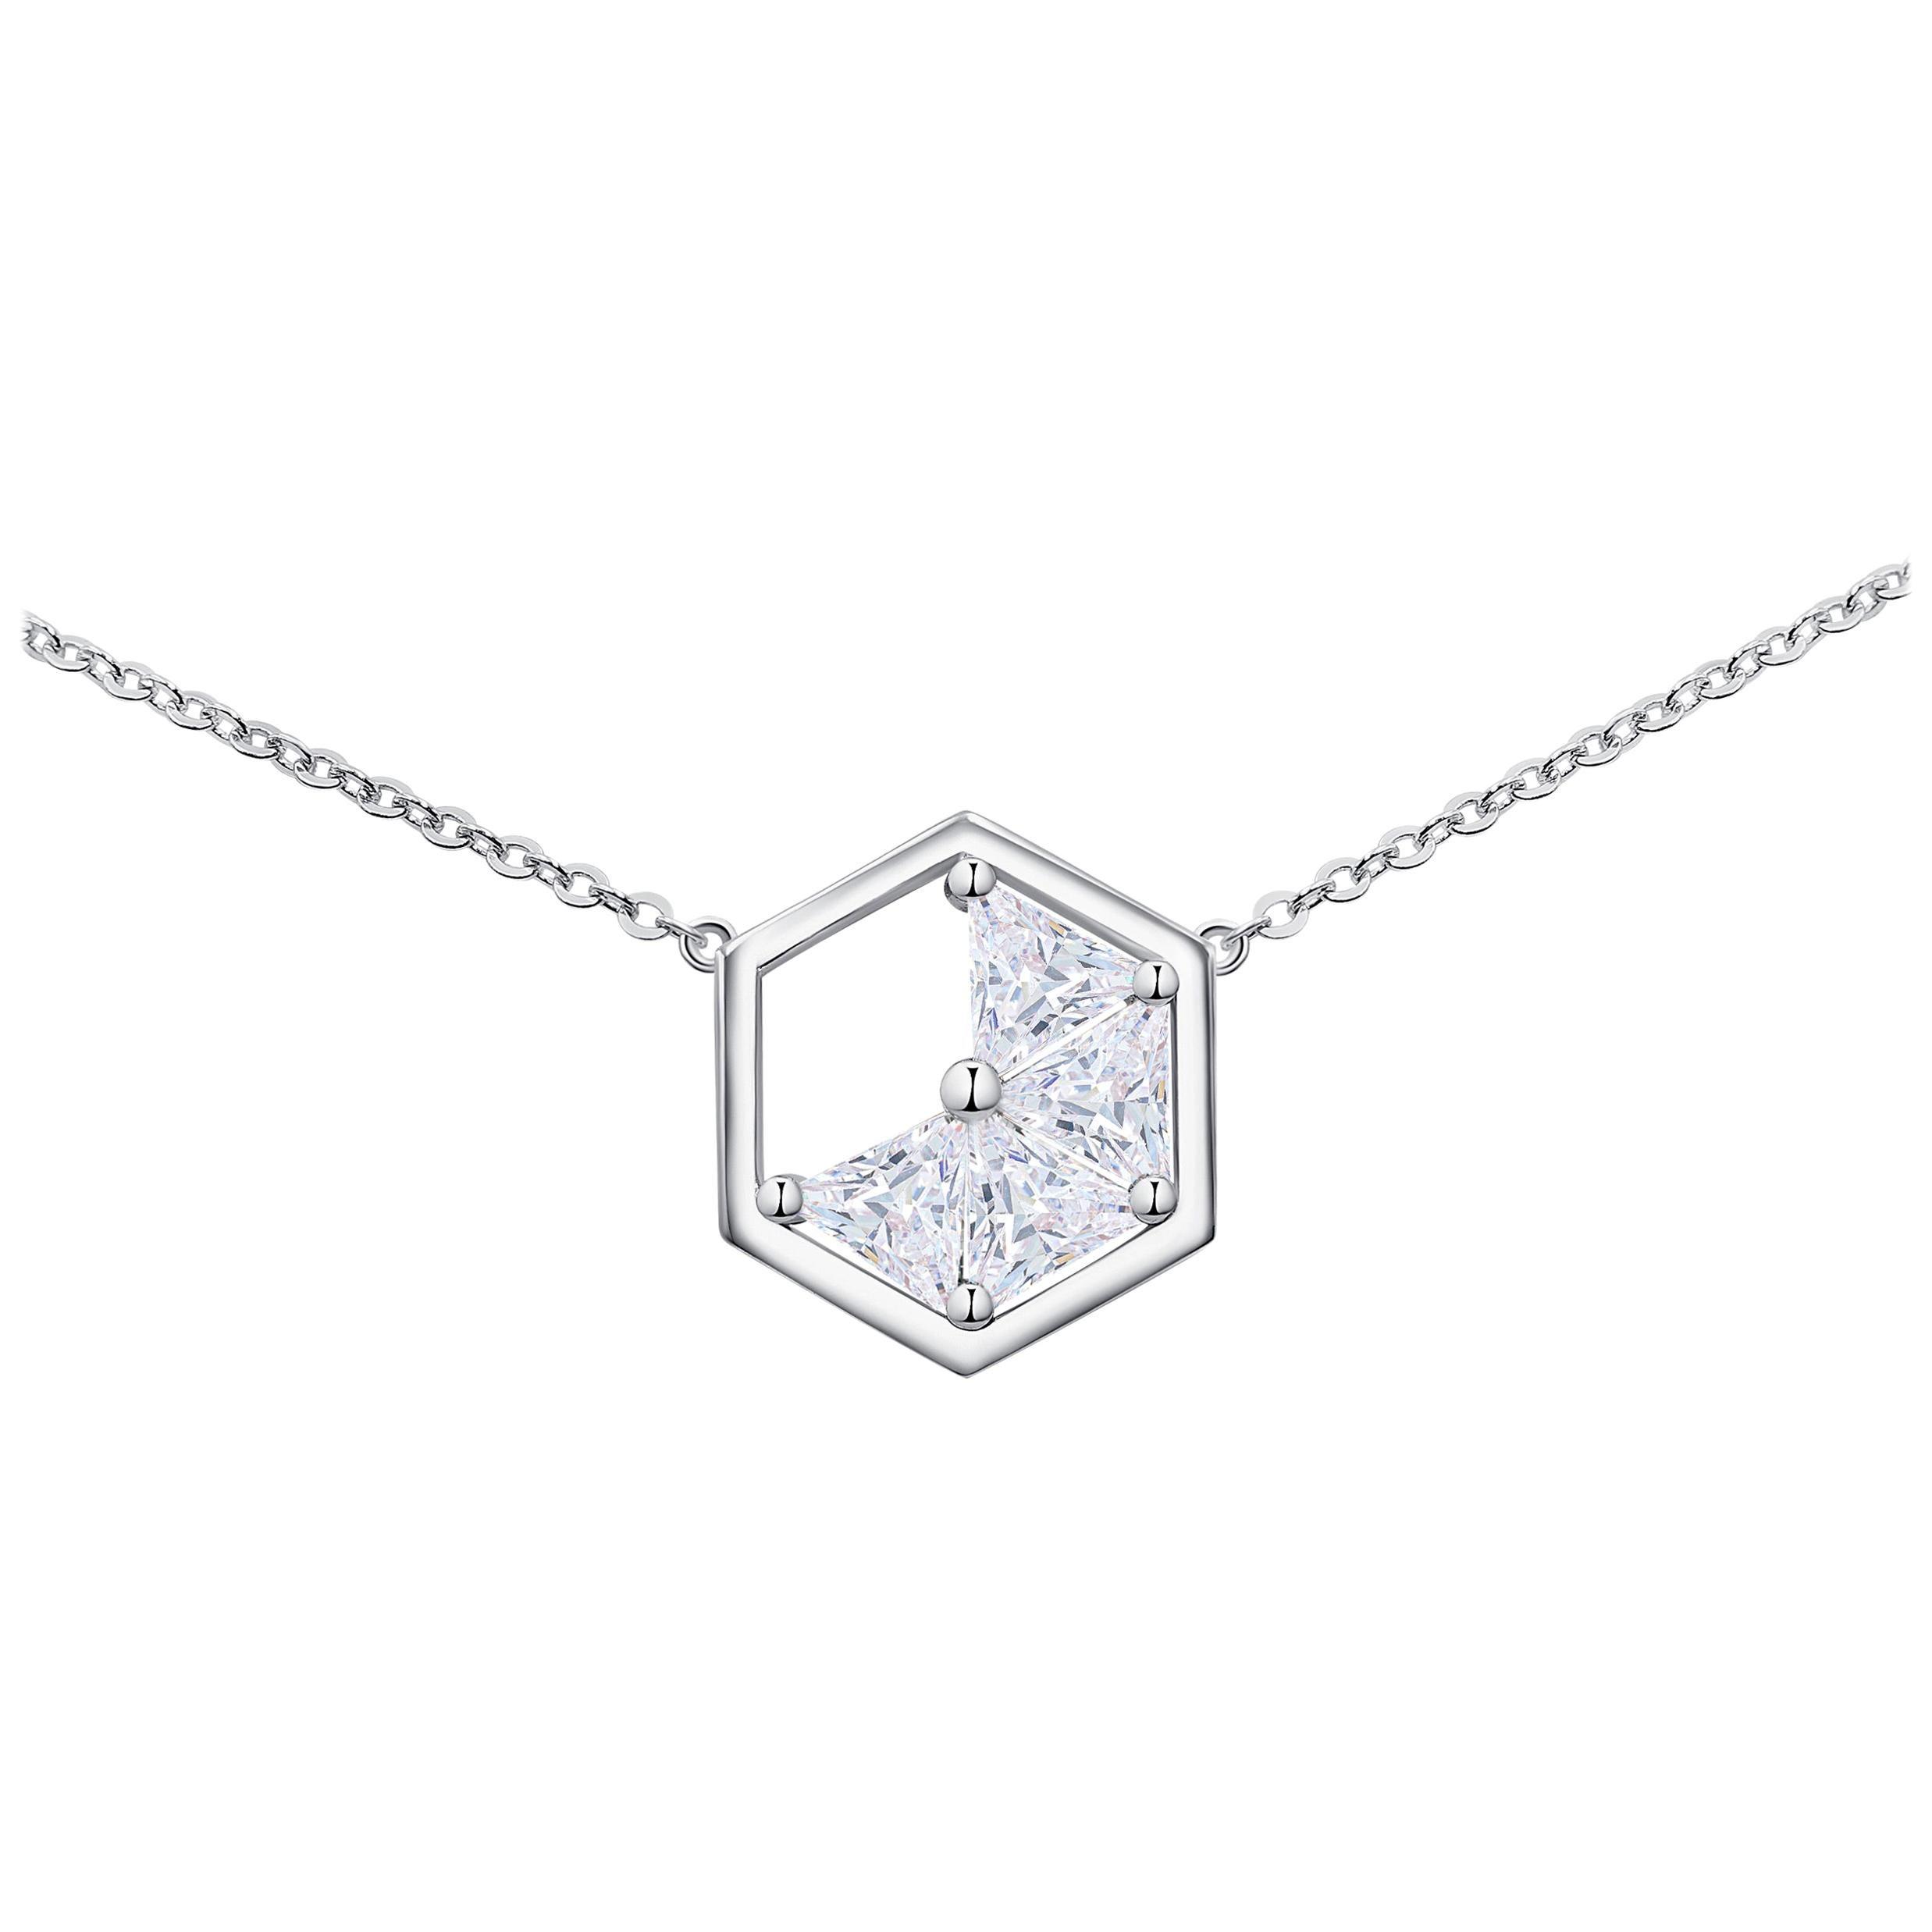 18 Karat White Gold Diamond Triangle Necklace